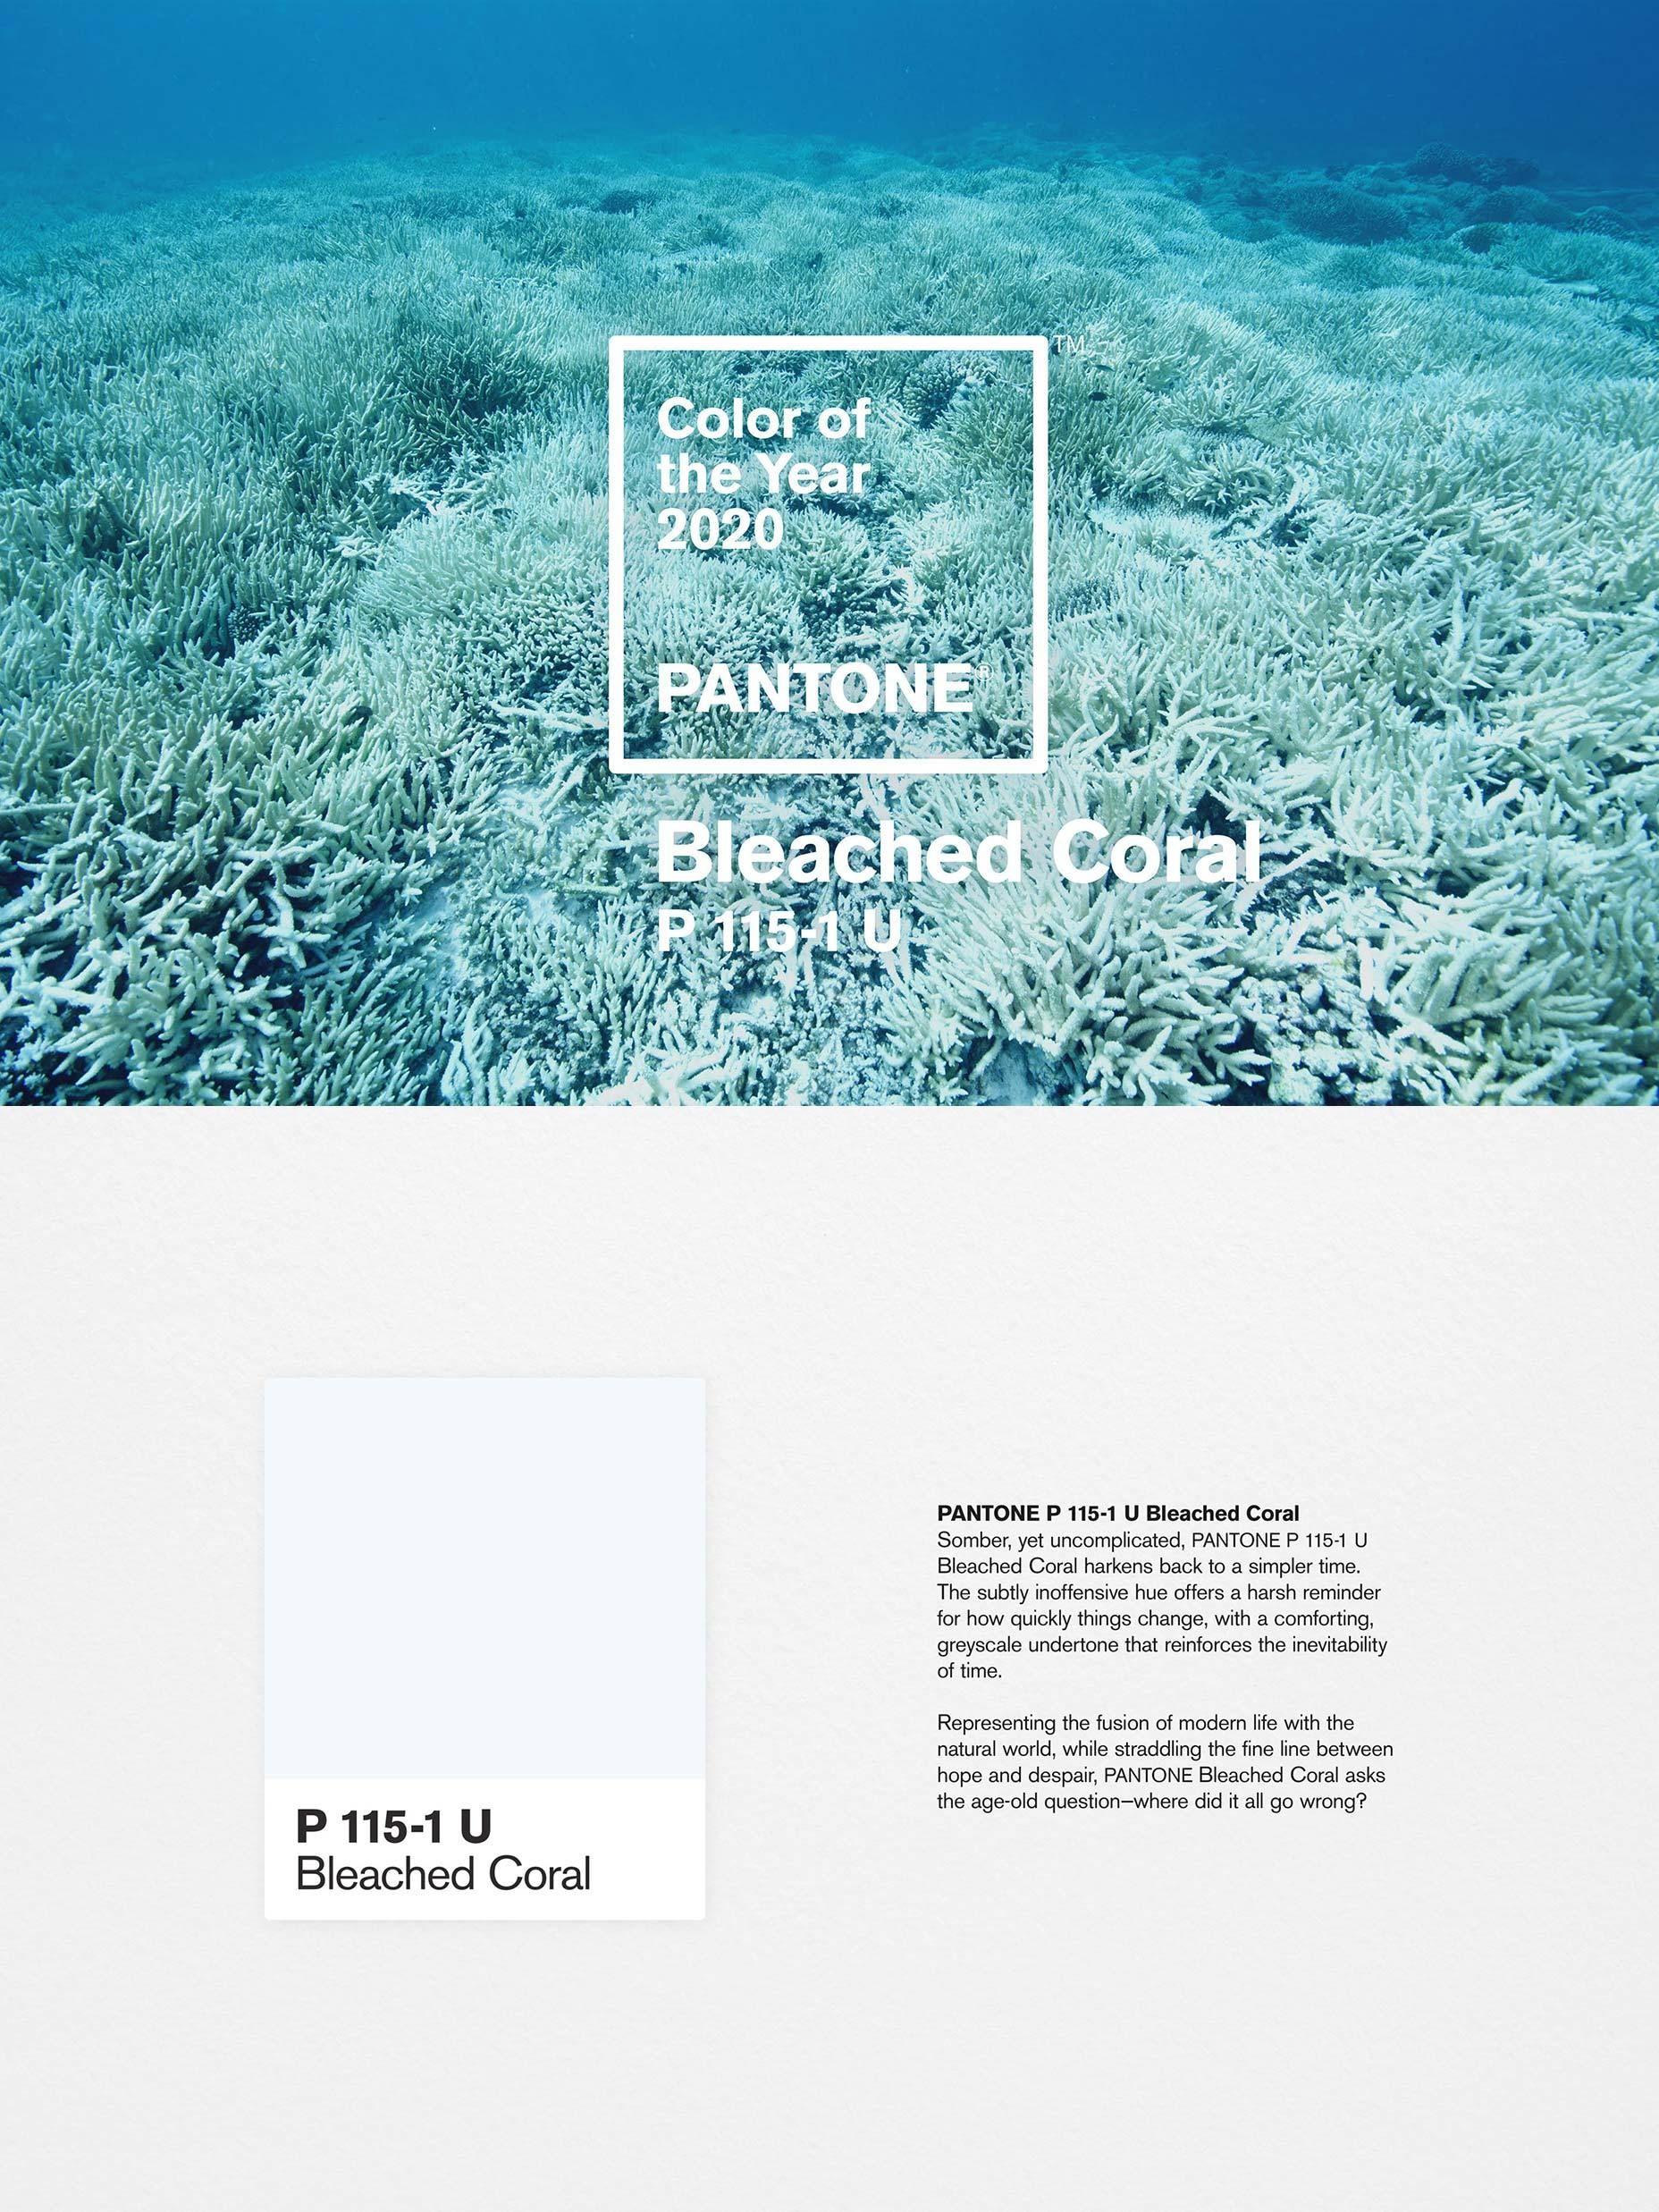 Unofficial Pantone Color for 2020 Revealed Pantone color